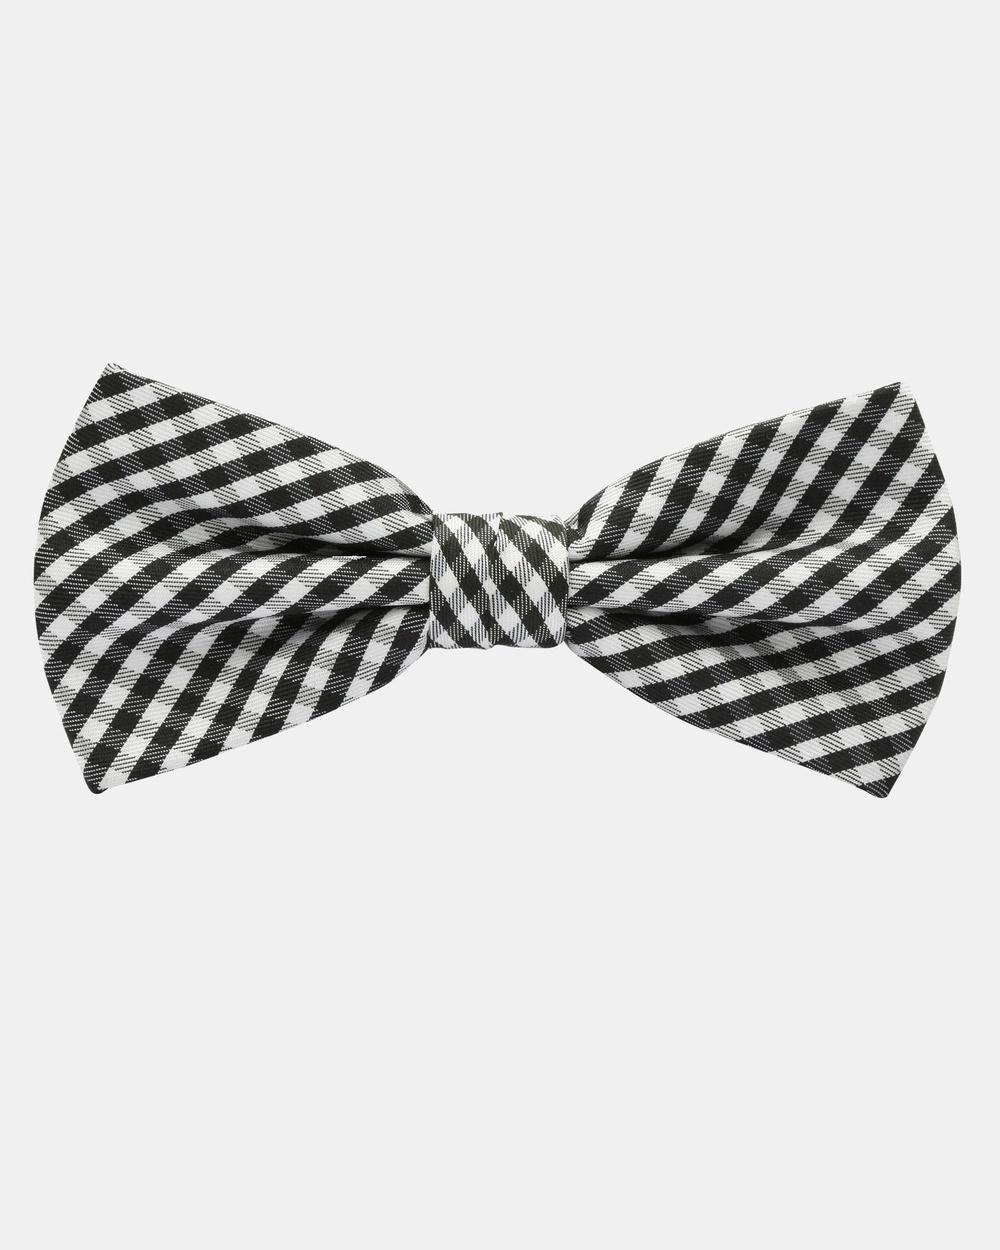 Buckle Vintage Check Bow Tie Ties & Cufflinks Check Australia